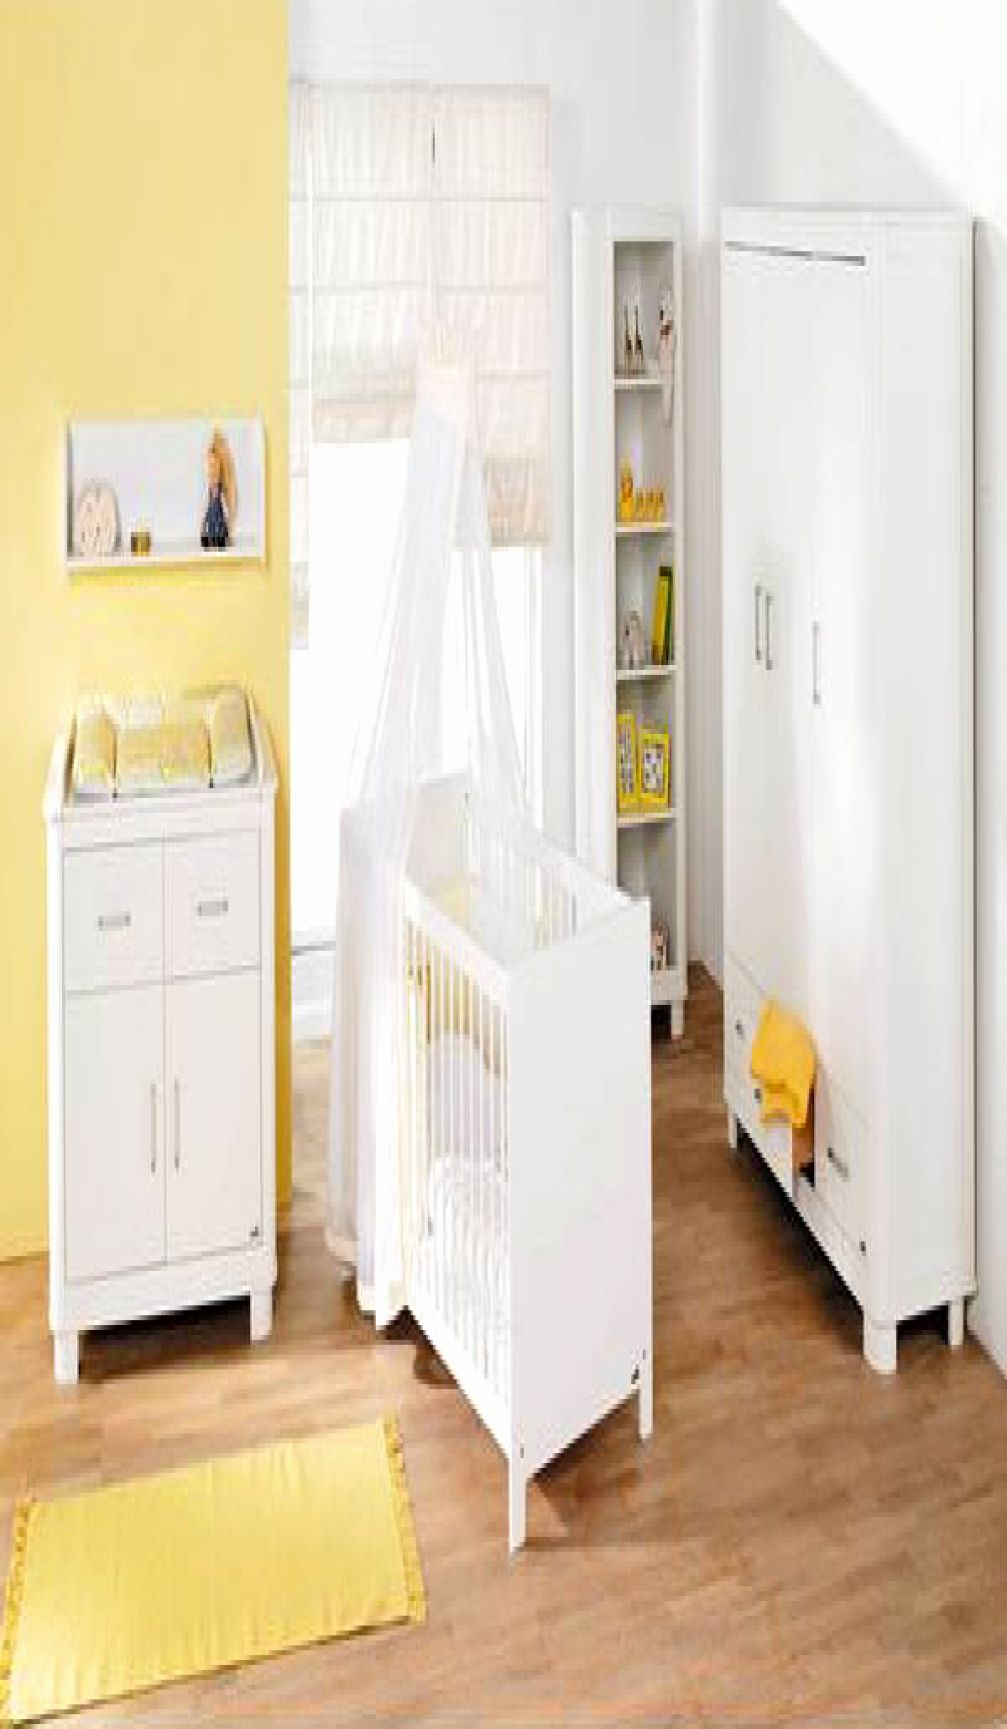 De Luxe Chambre Bebe Conforama In 2020 Bed Baby Bed Baby Room